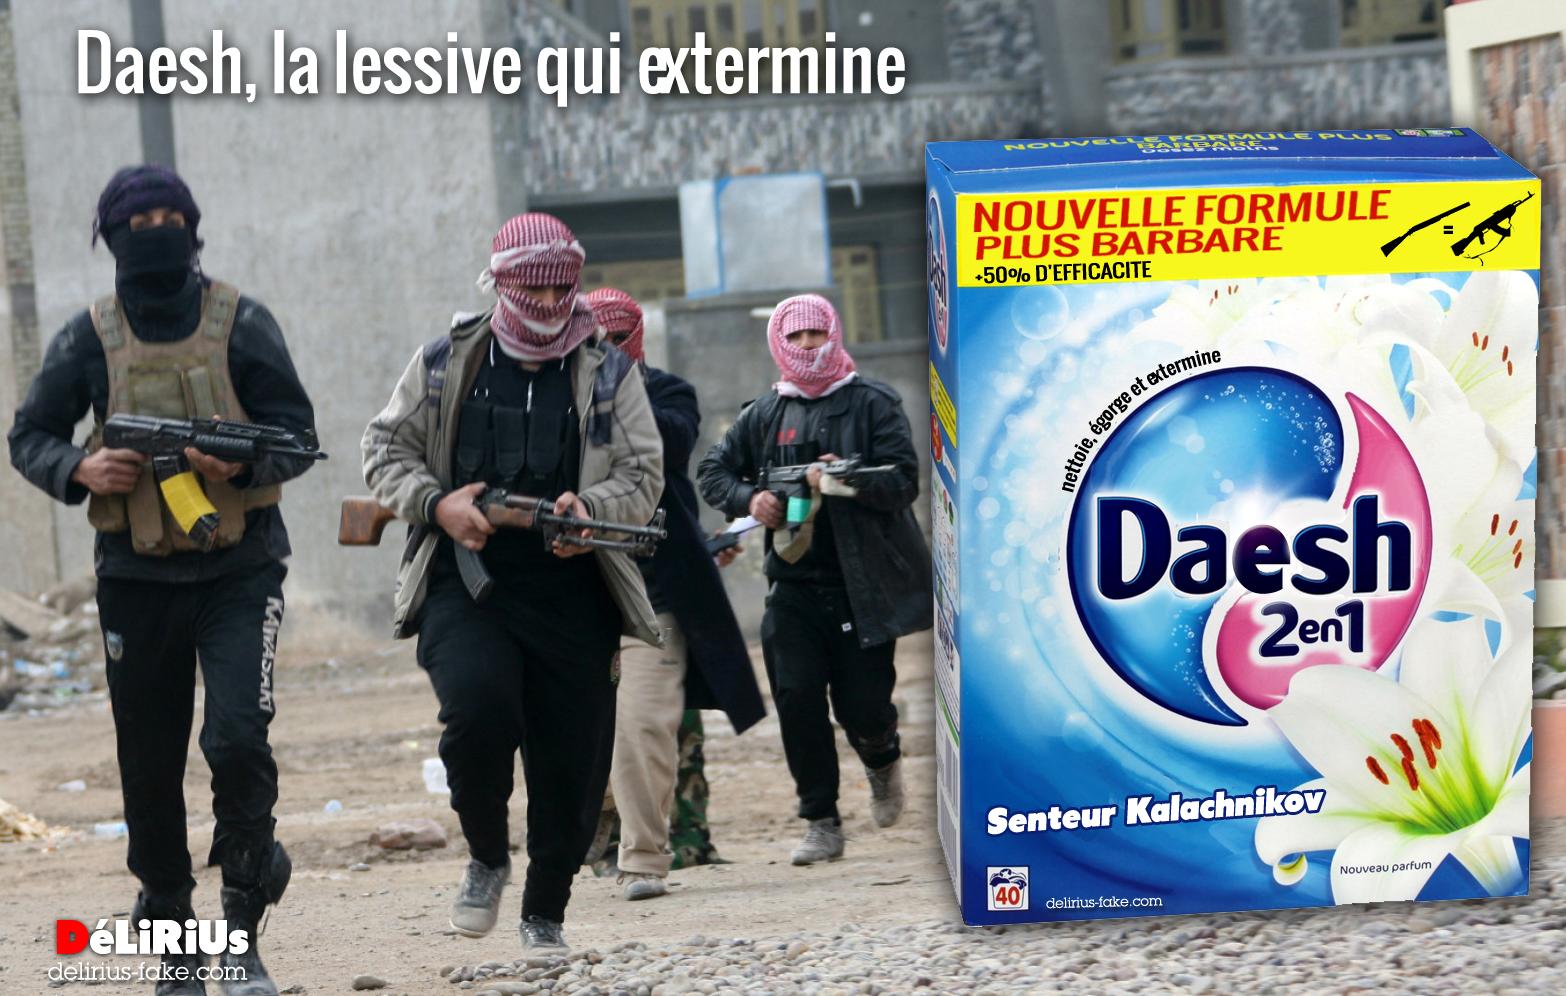 http://jforum.fr/wp-content/uploads/2015/03/Daesh-lessive-d%C3%A9lirius.jpg